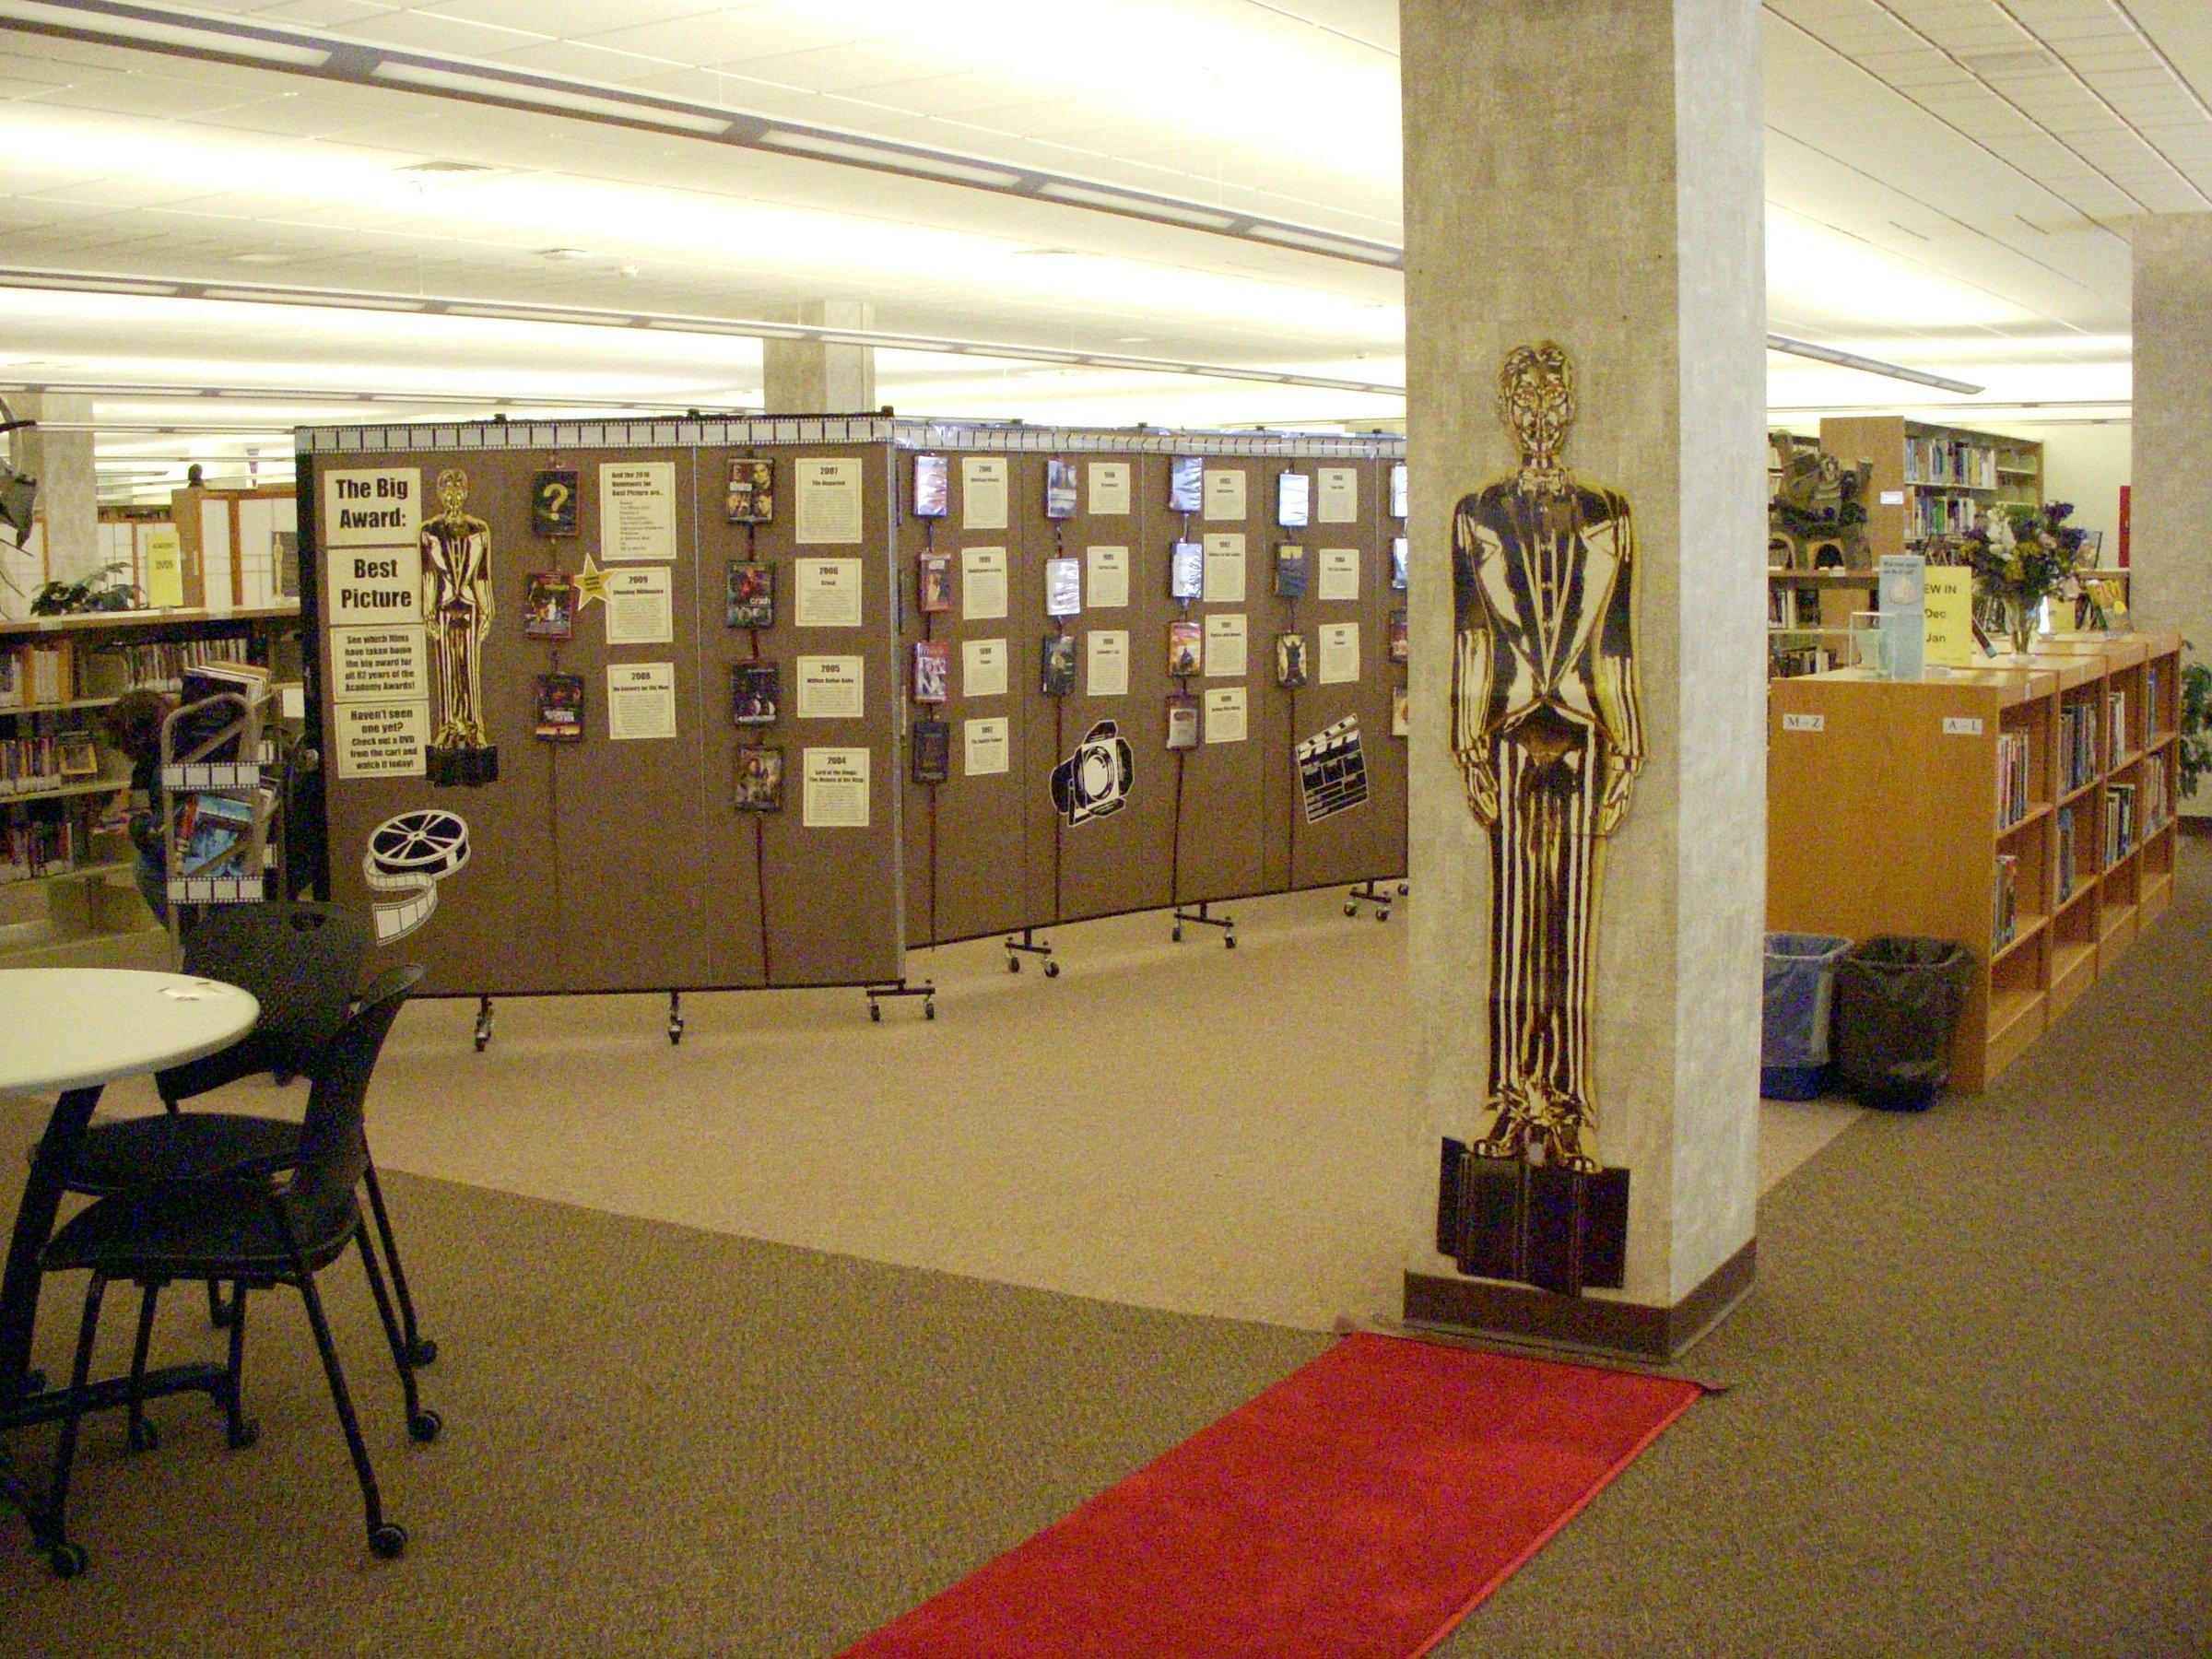 School library display Oscars trivia